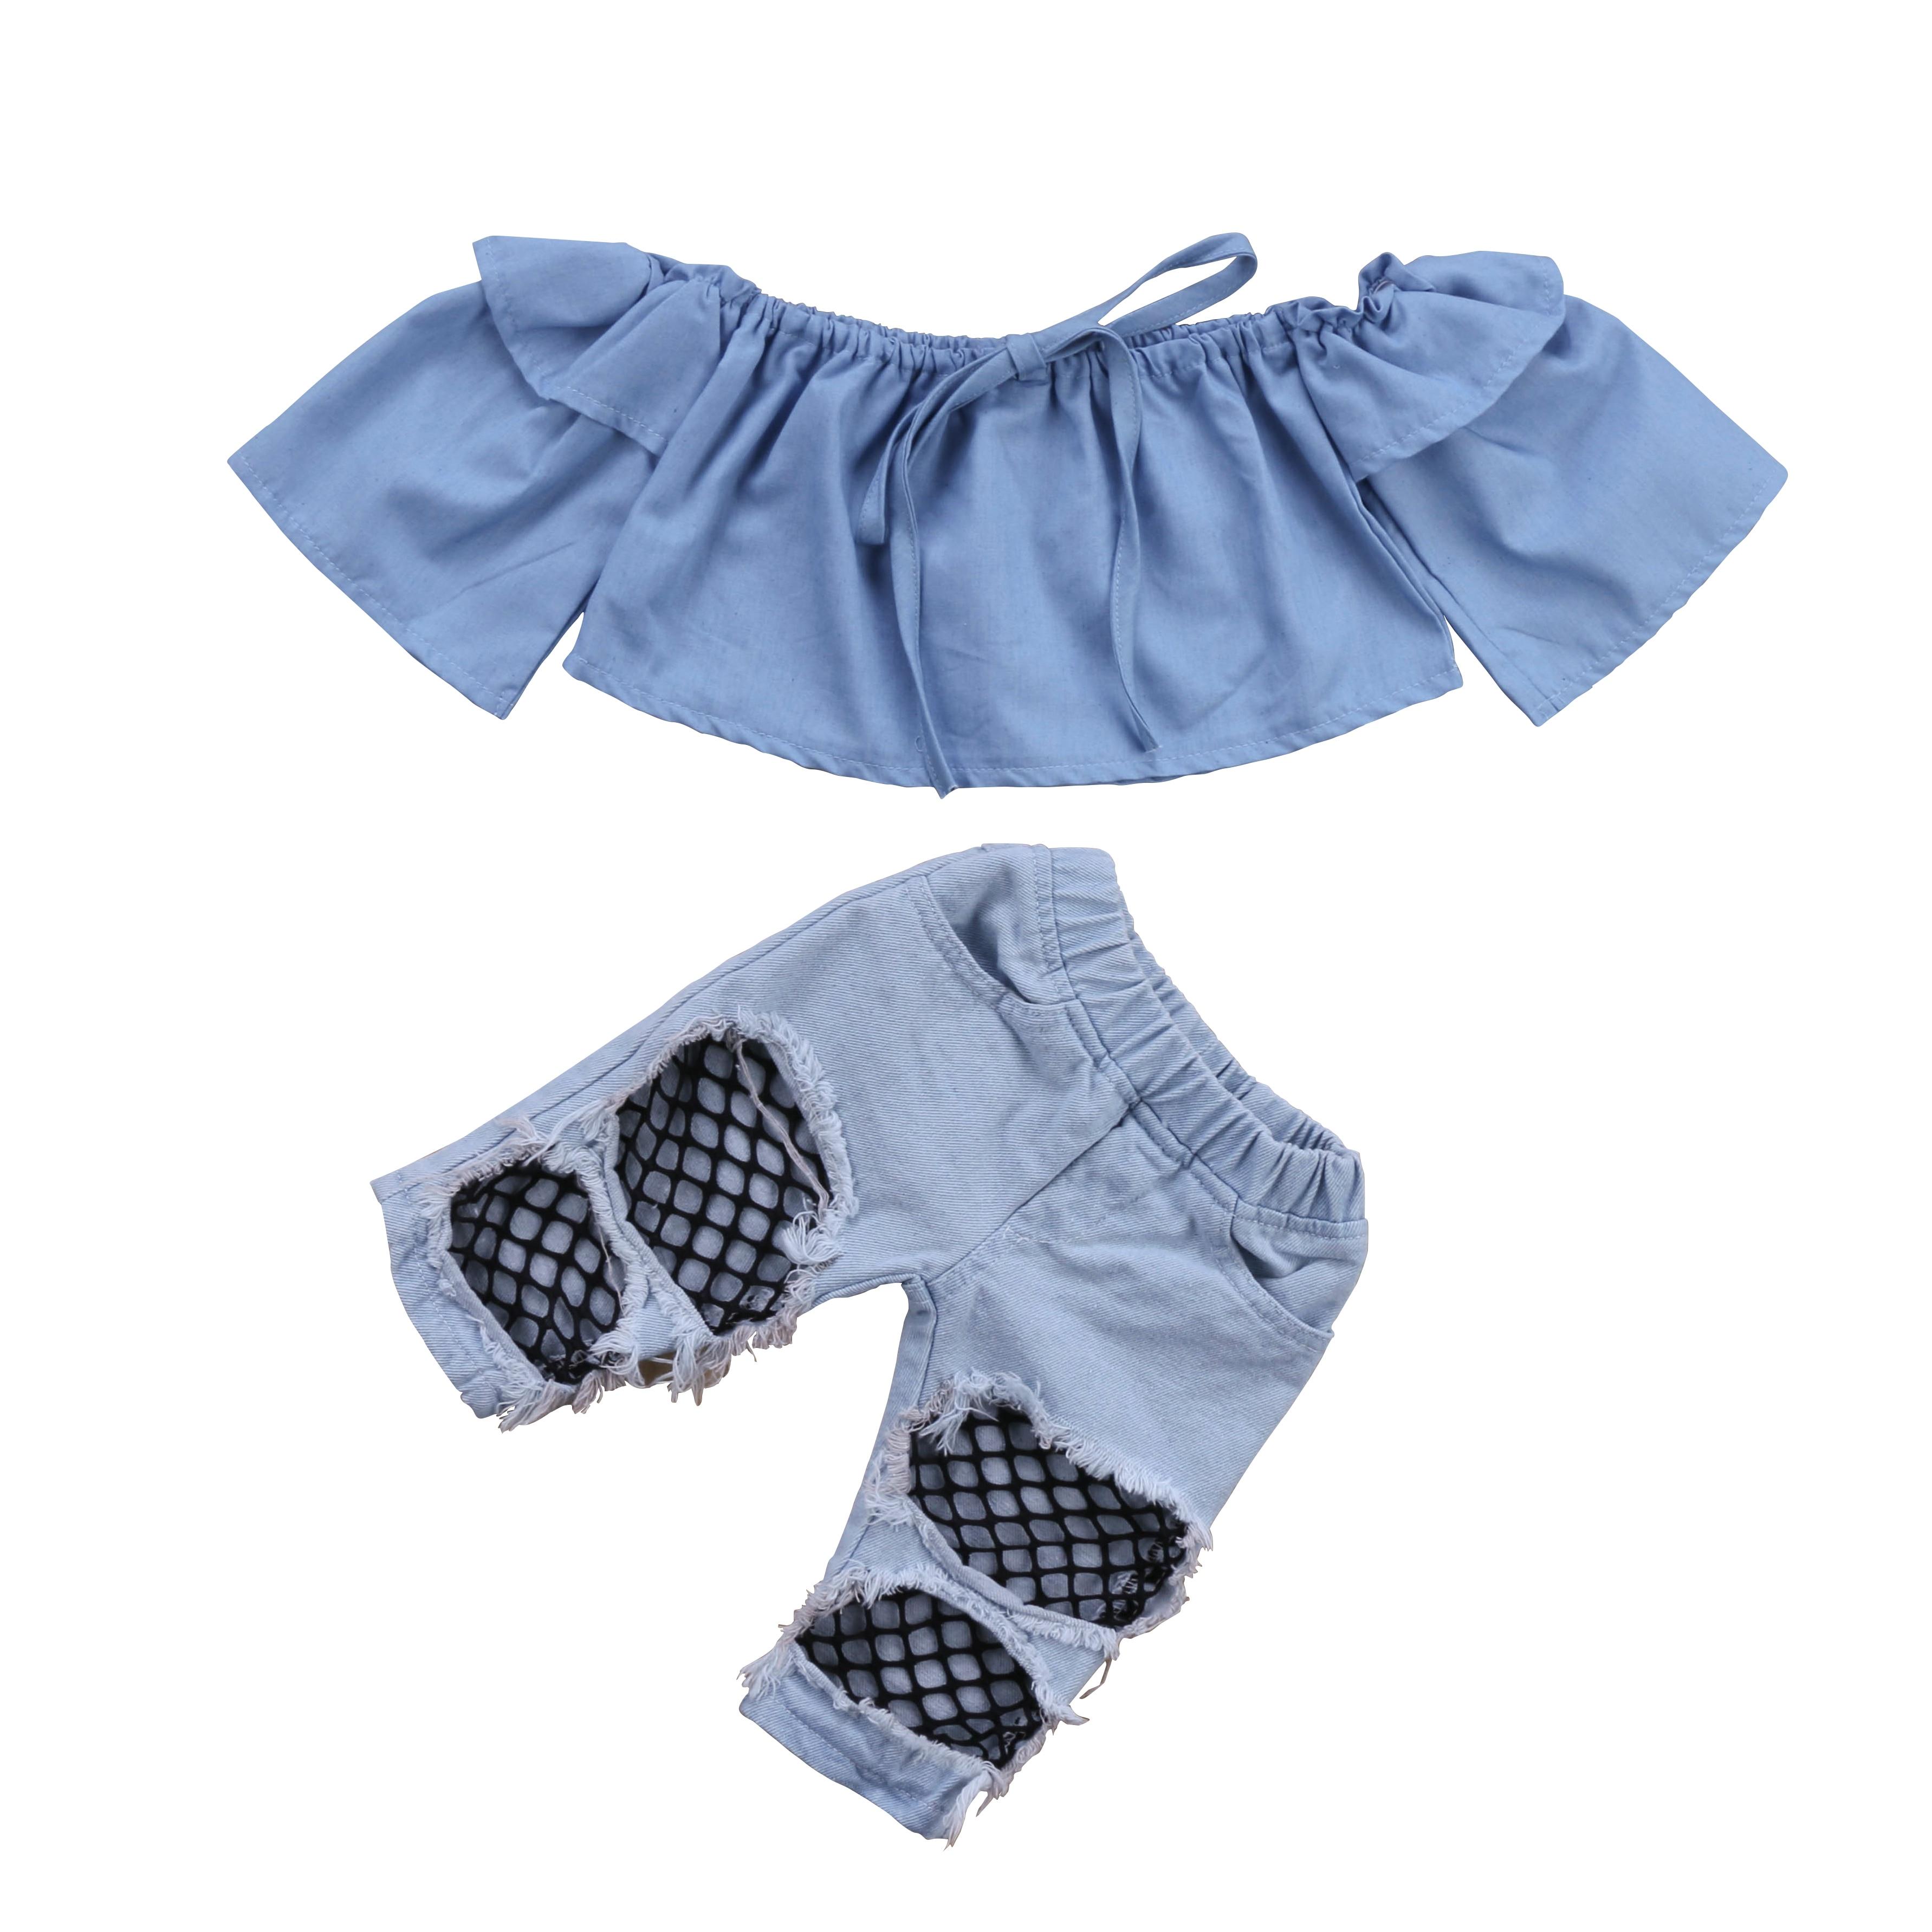 3PCS Infant Baby Boy Girl Romper Tops Plaid Shorts Pants Headband Outfits Set UK